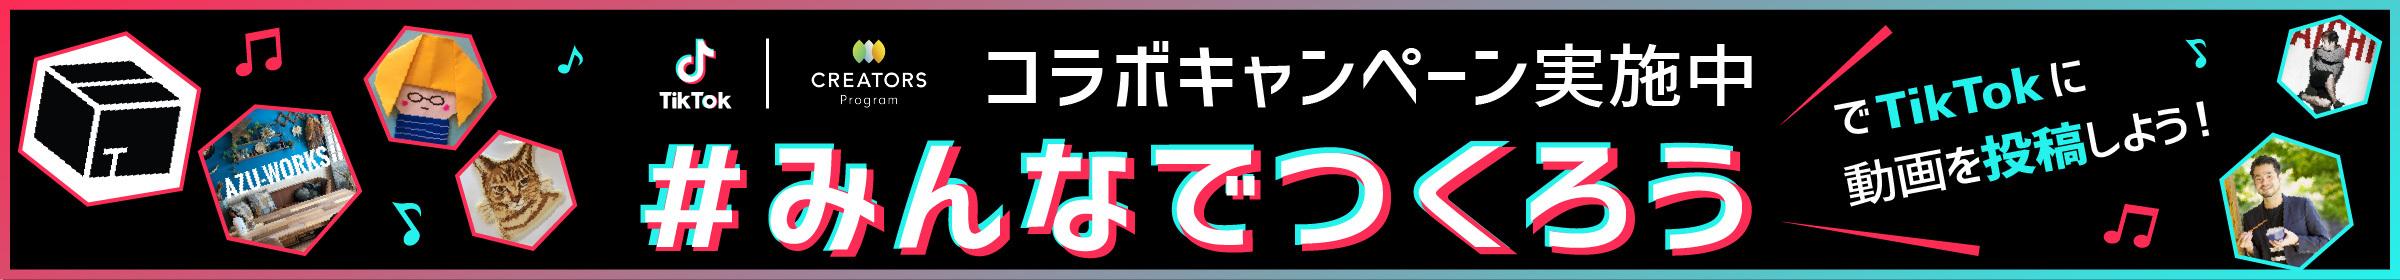 TikTok動画投稿キャンペーン